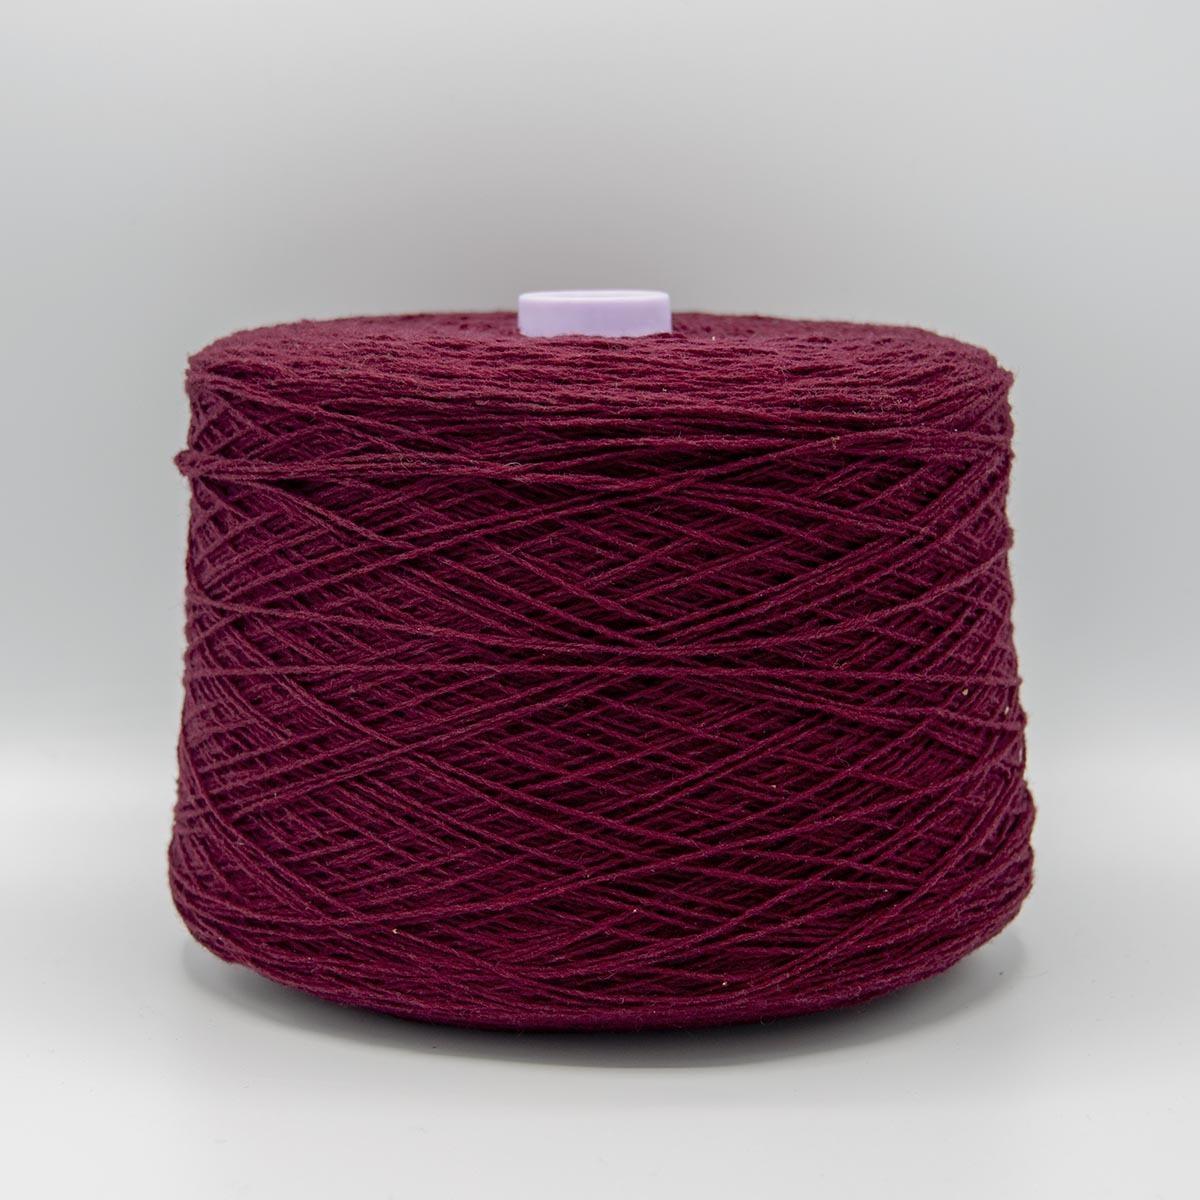 Knoll Yarns Merino Lambswool - 111